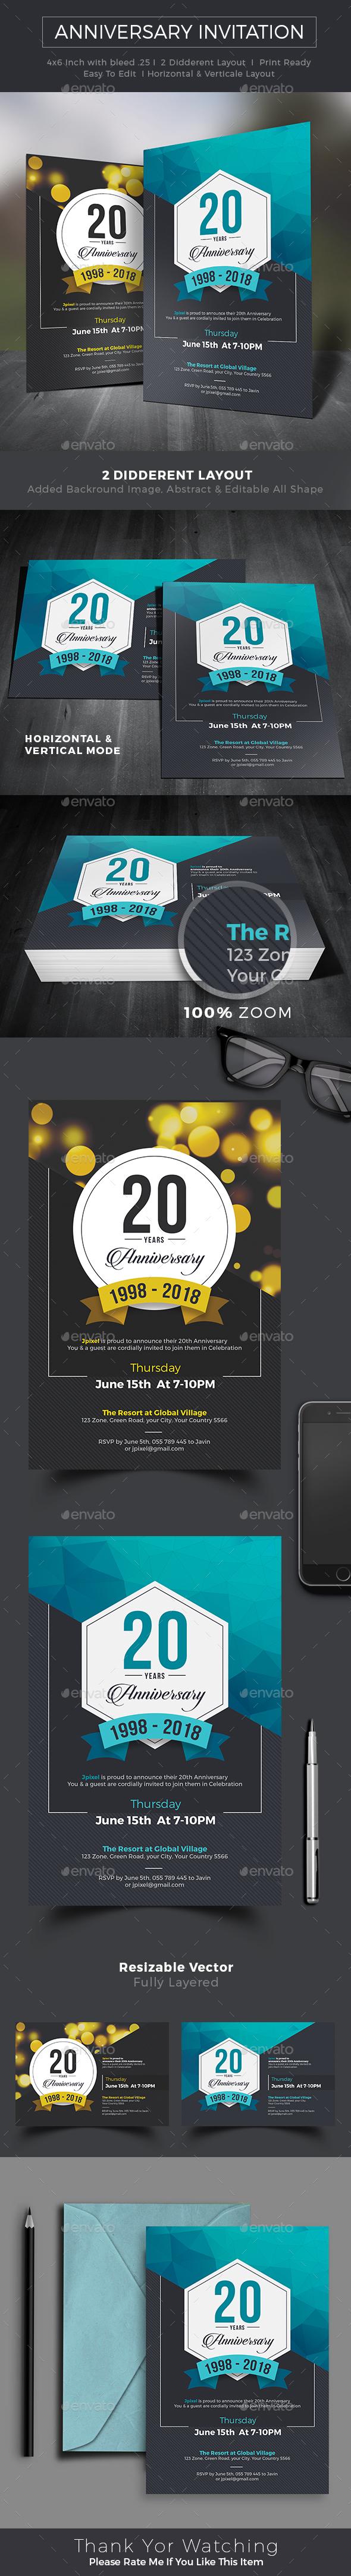 Anniversary Invitation